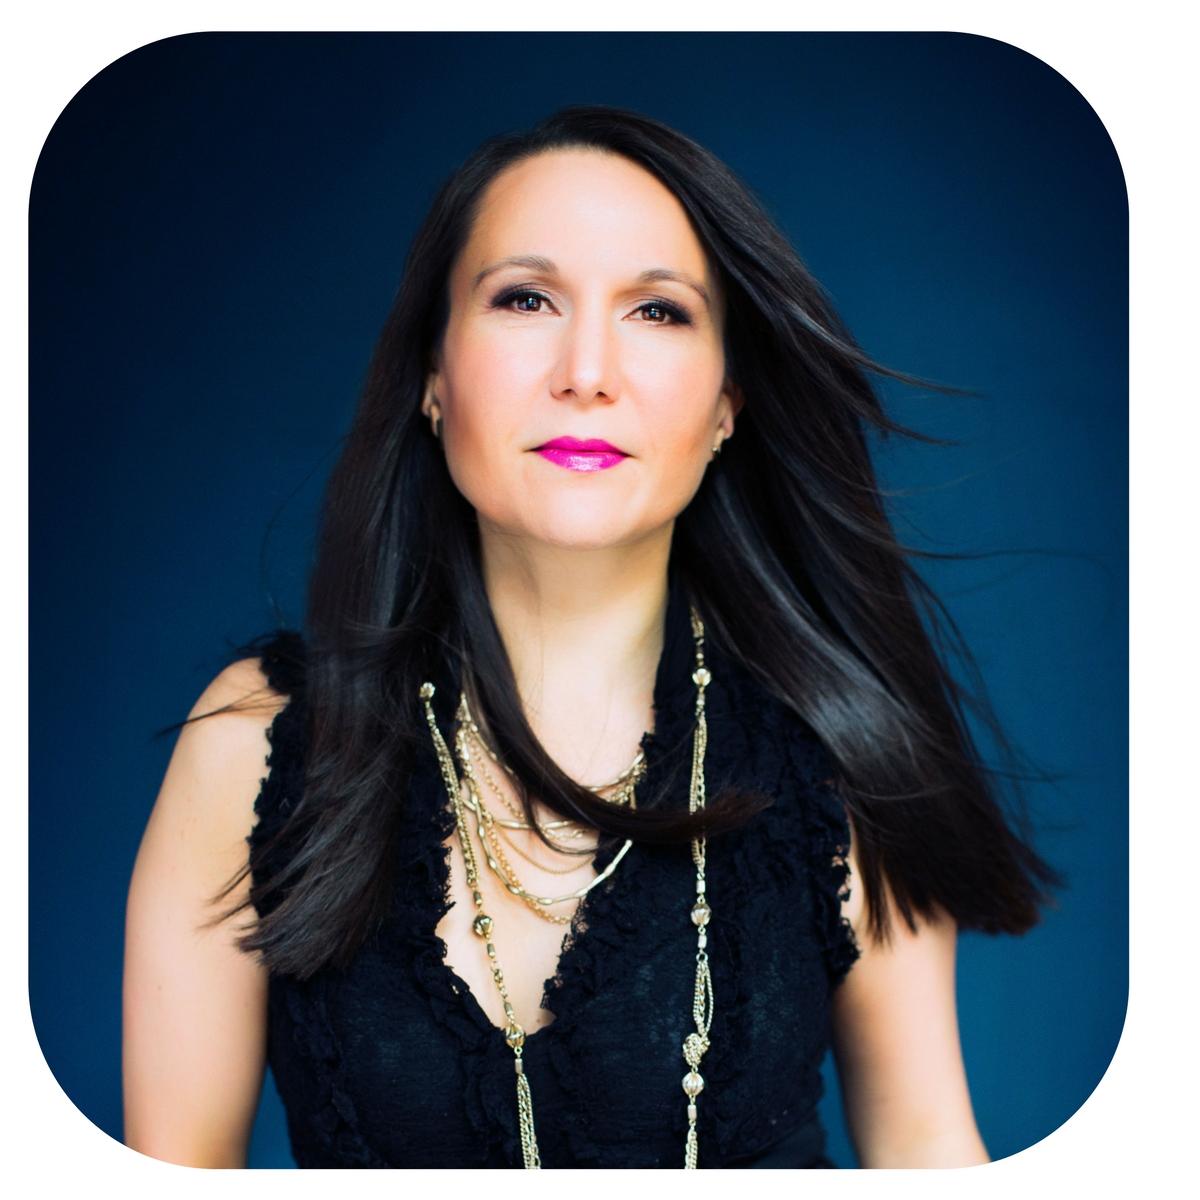 Lena D. Meyer, Transformational Life Coach, Founder of Gratitude6